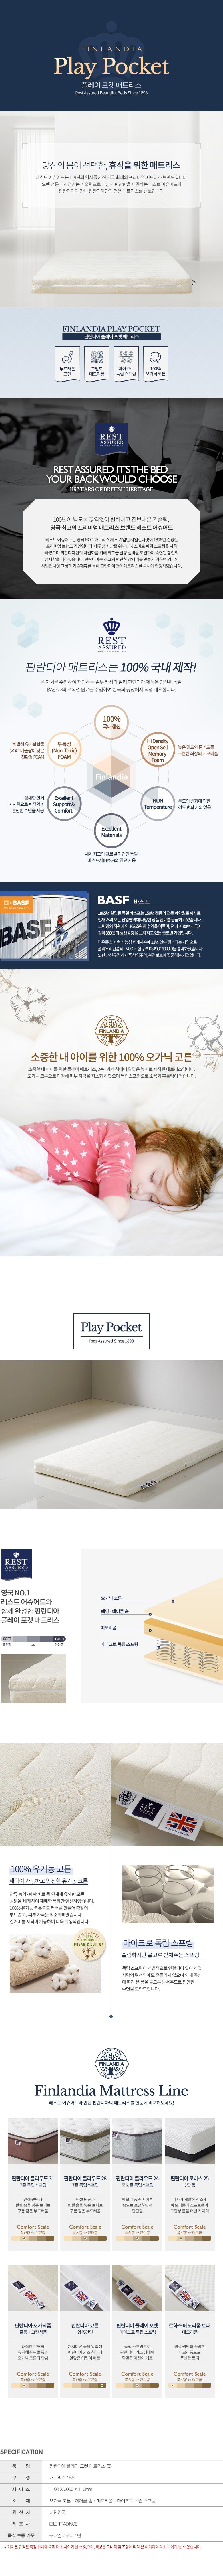 playpoket_SS.jpg